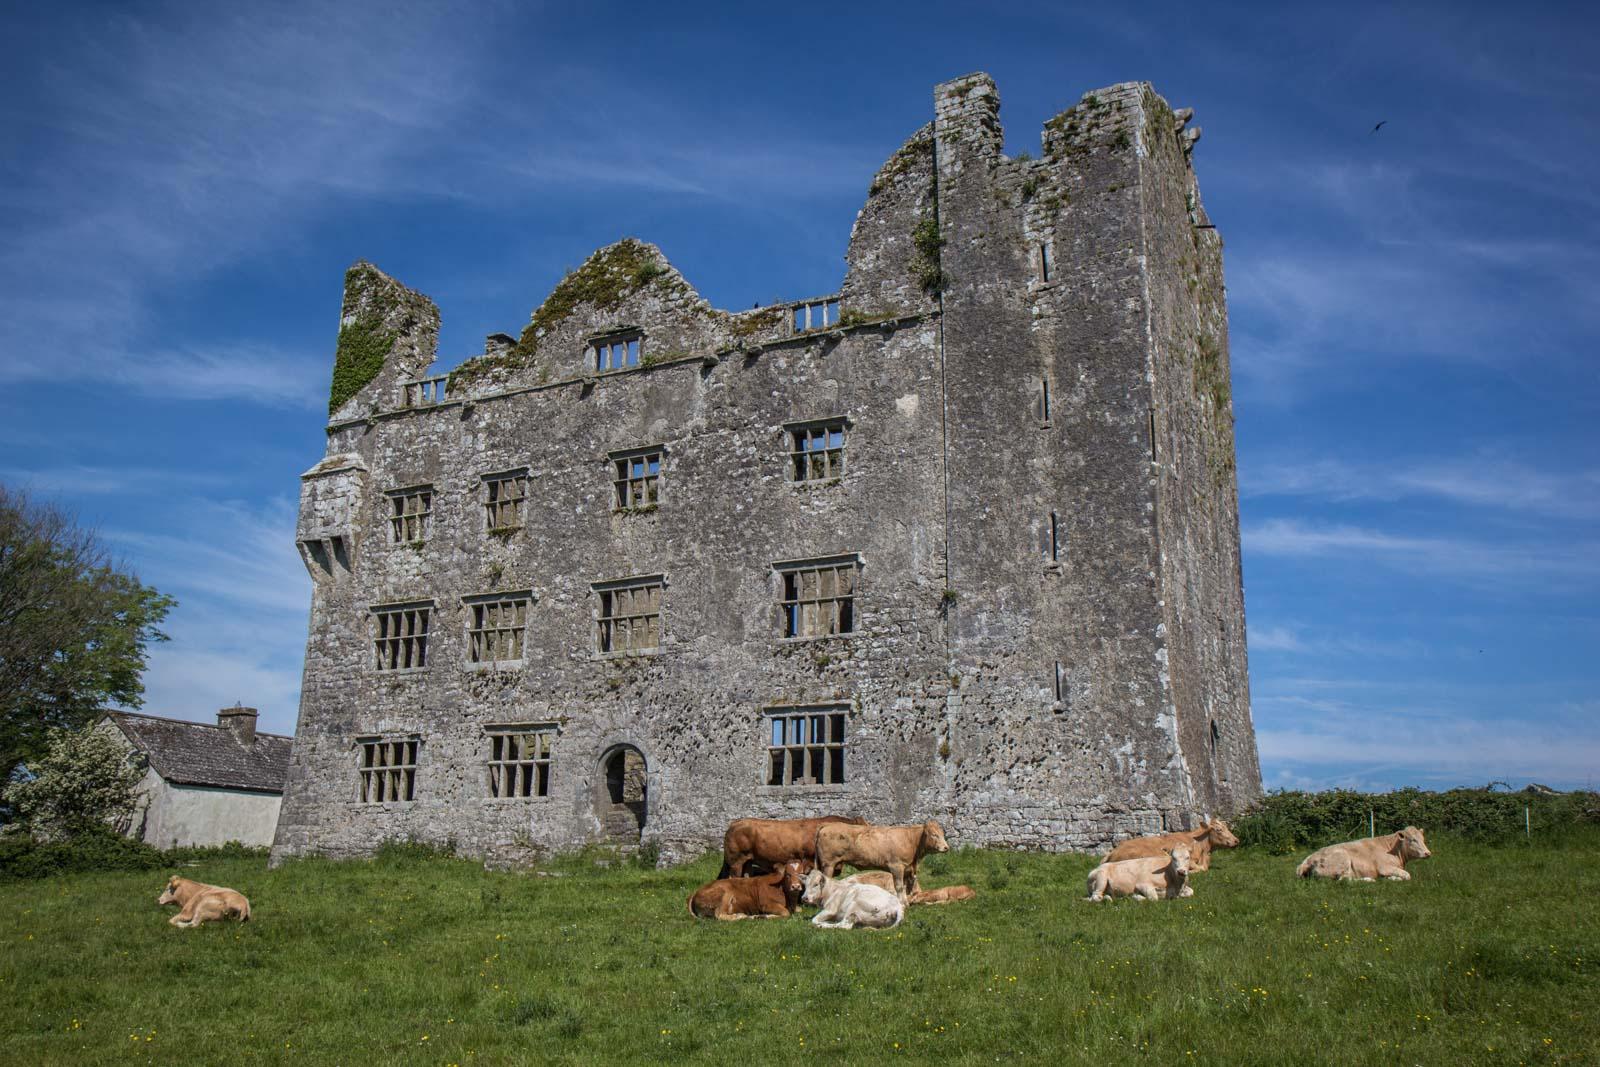 Ireland, countryside, sun, blue skies, beautiful Ireland photos